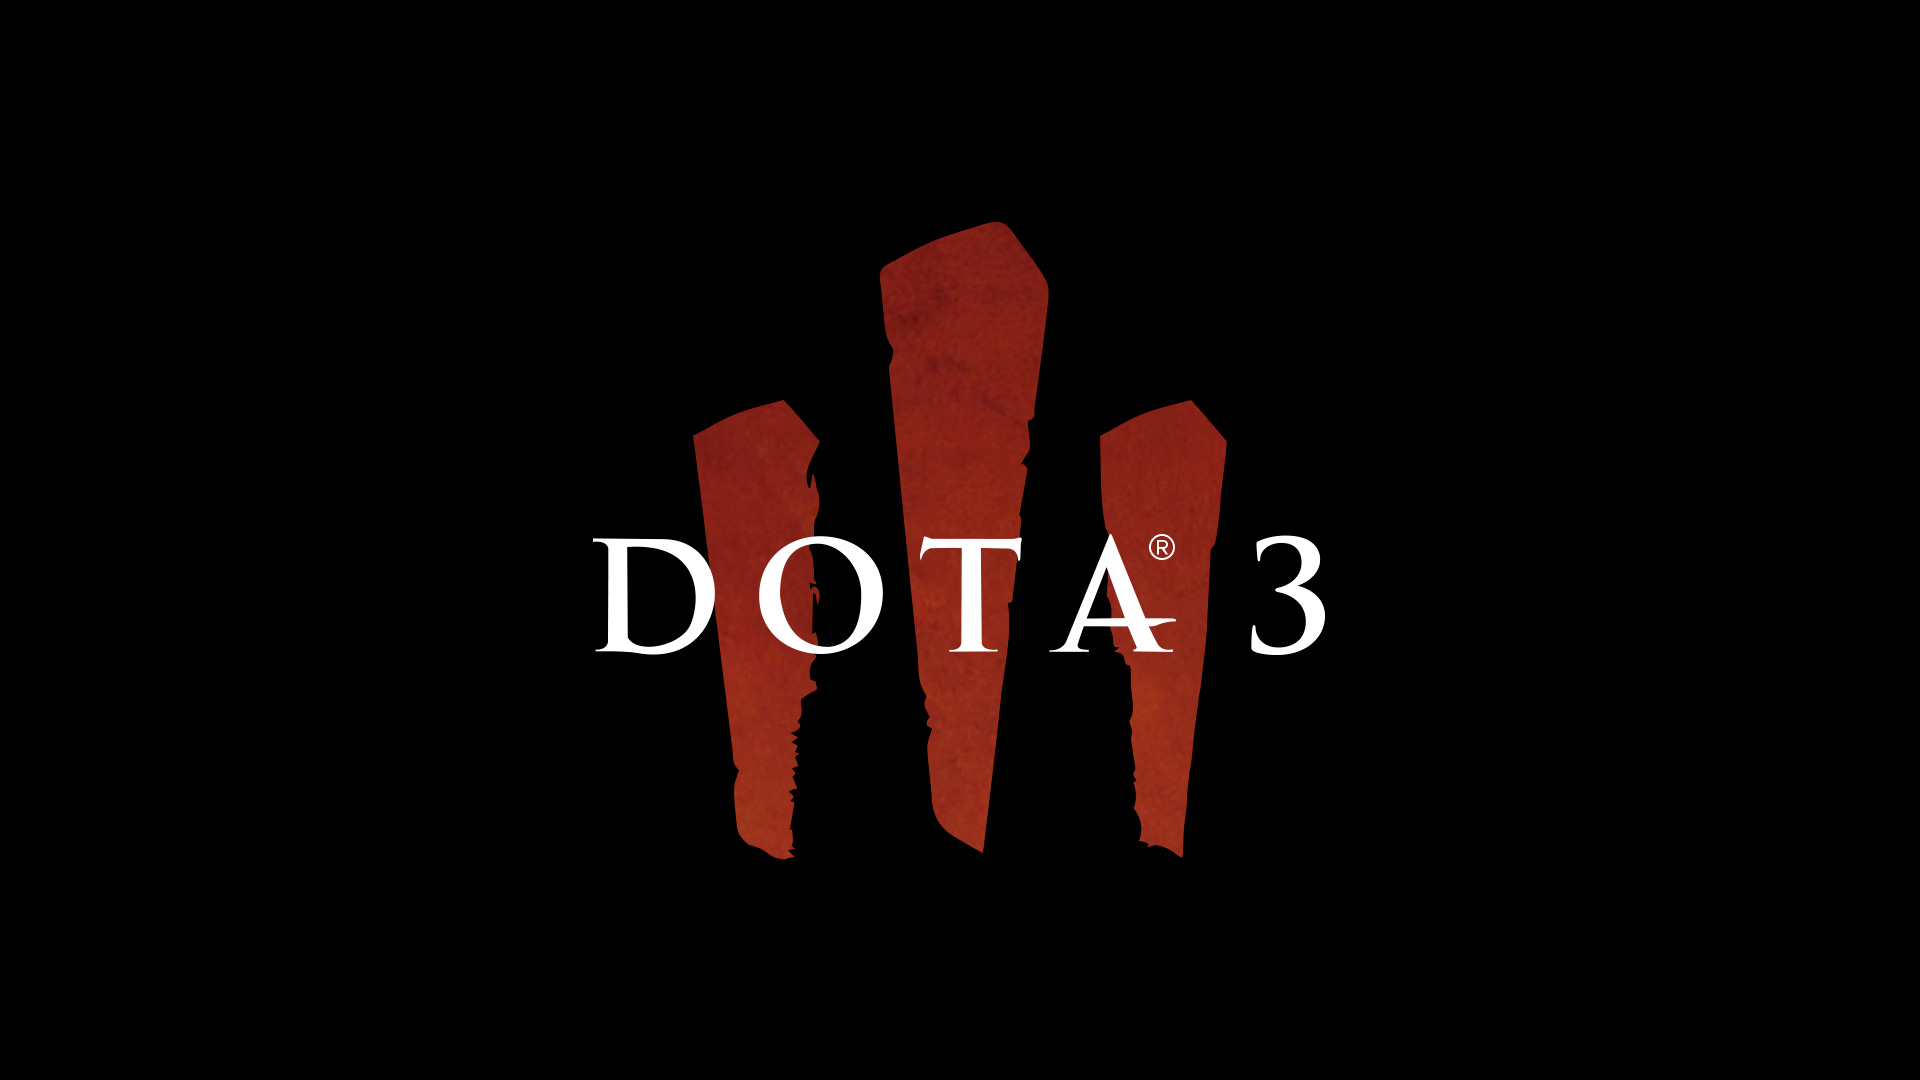 Dota 2 | Bleacher Report | Latest News, Rumors, Scores and Highlights